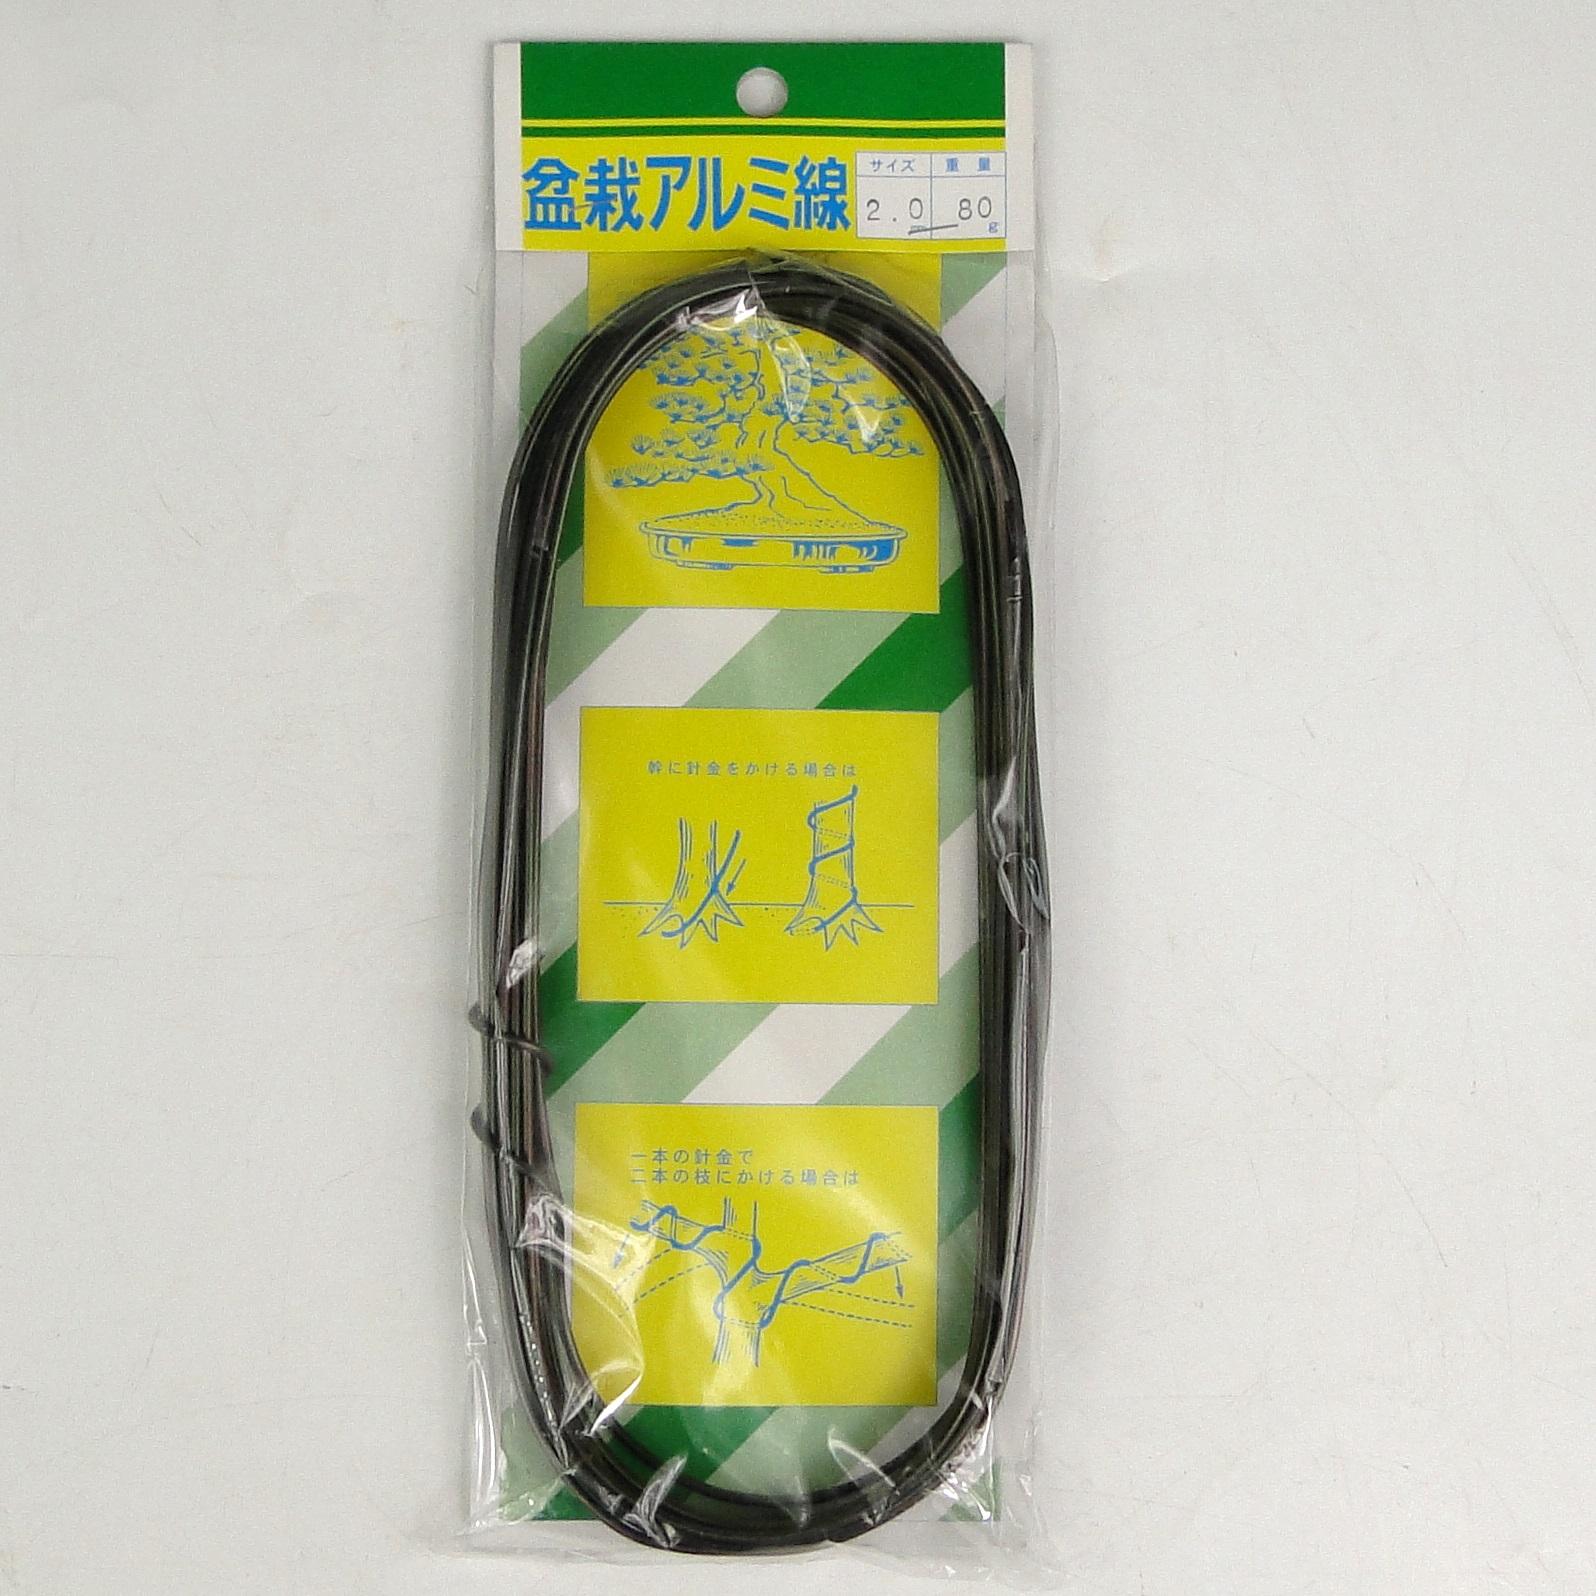 Проволока для бонсай 2,0 мм